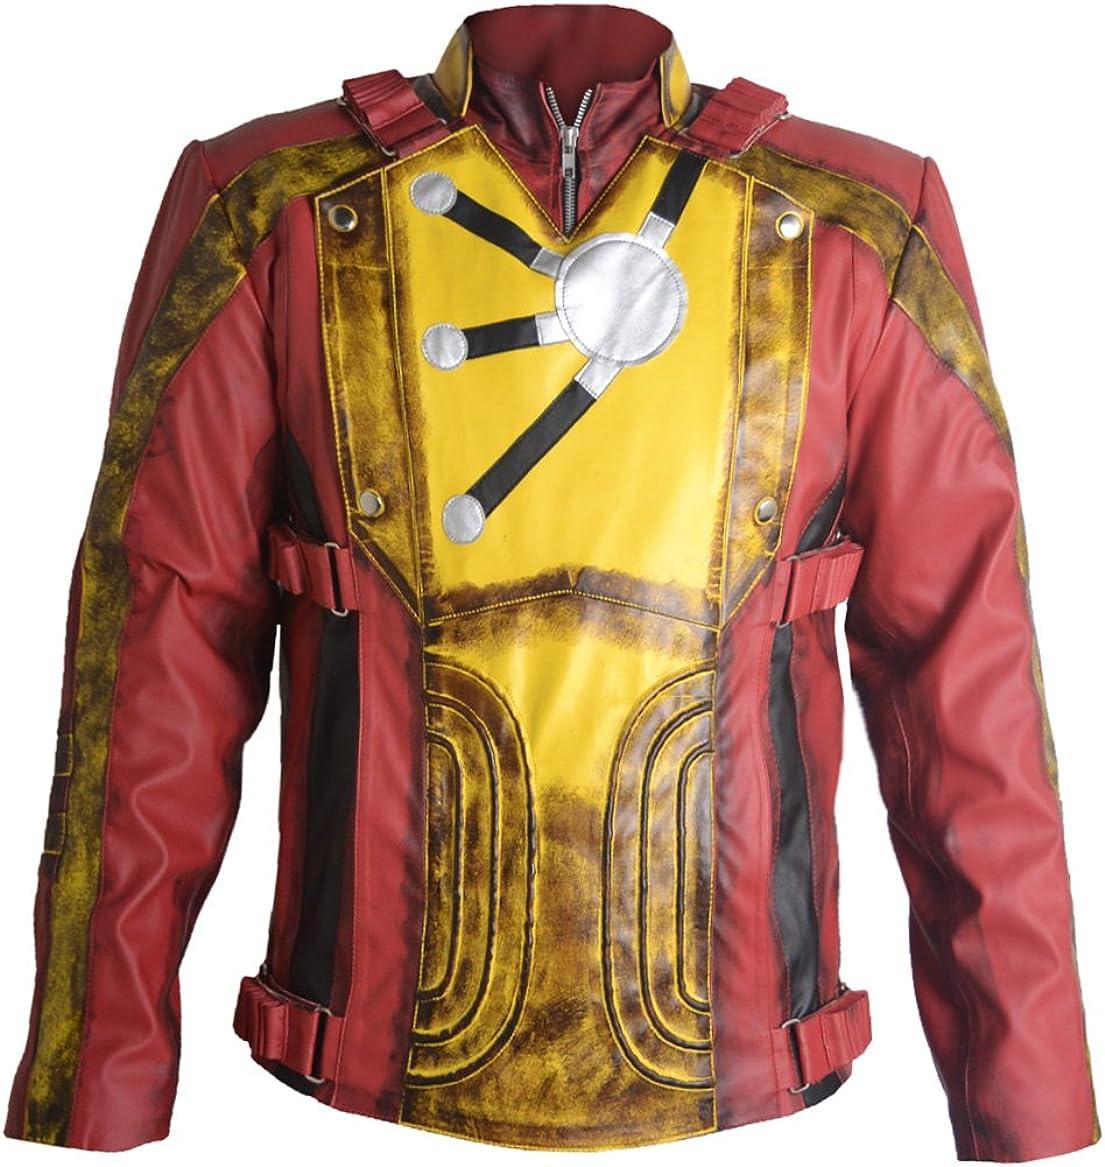 Blazrd Mens Firestorm Fashion Legends of Tomorrow Leather Jacket